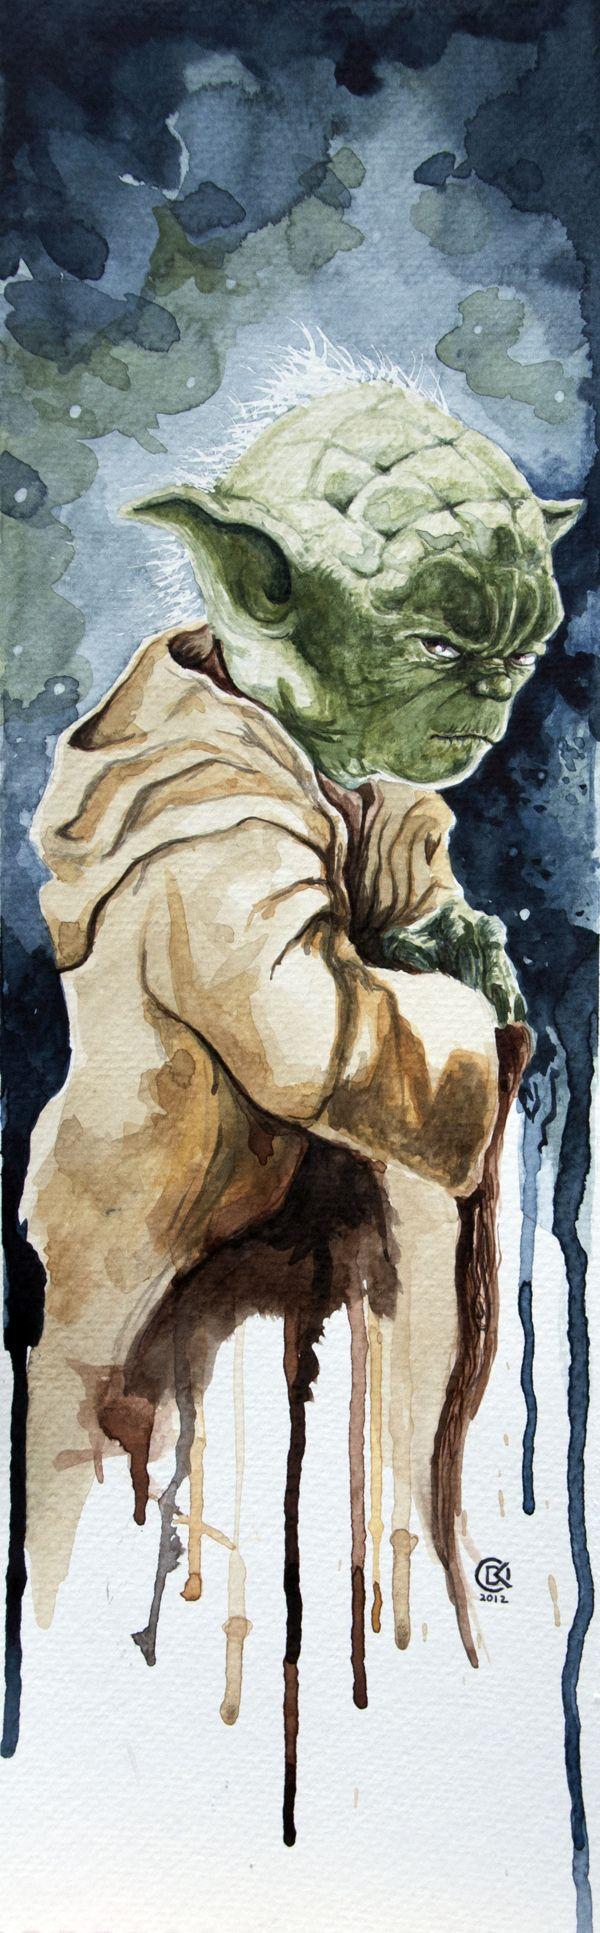 Yoda (watercolor study) | By: David Kraig, via Behance (#yoda #starwars)